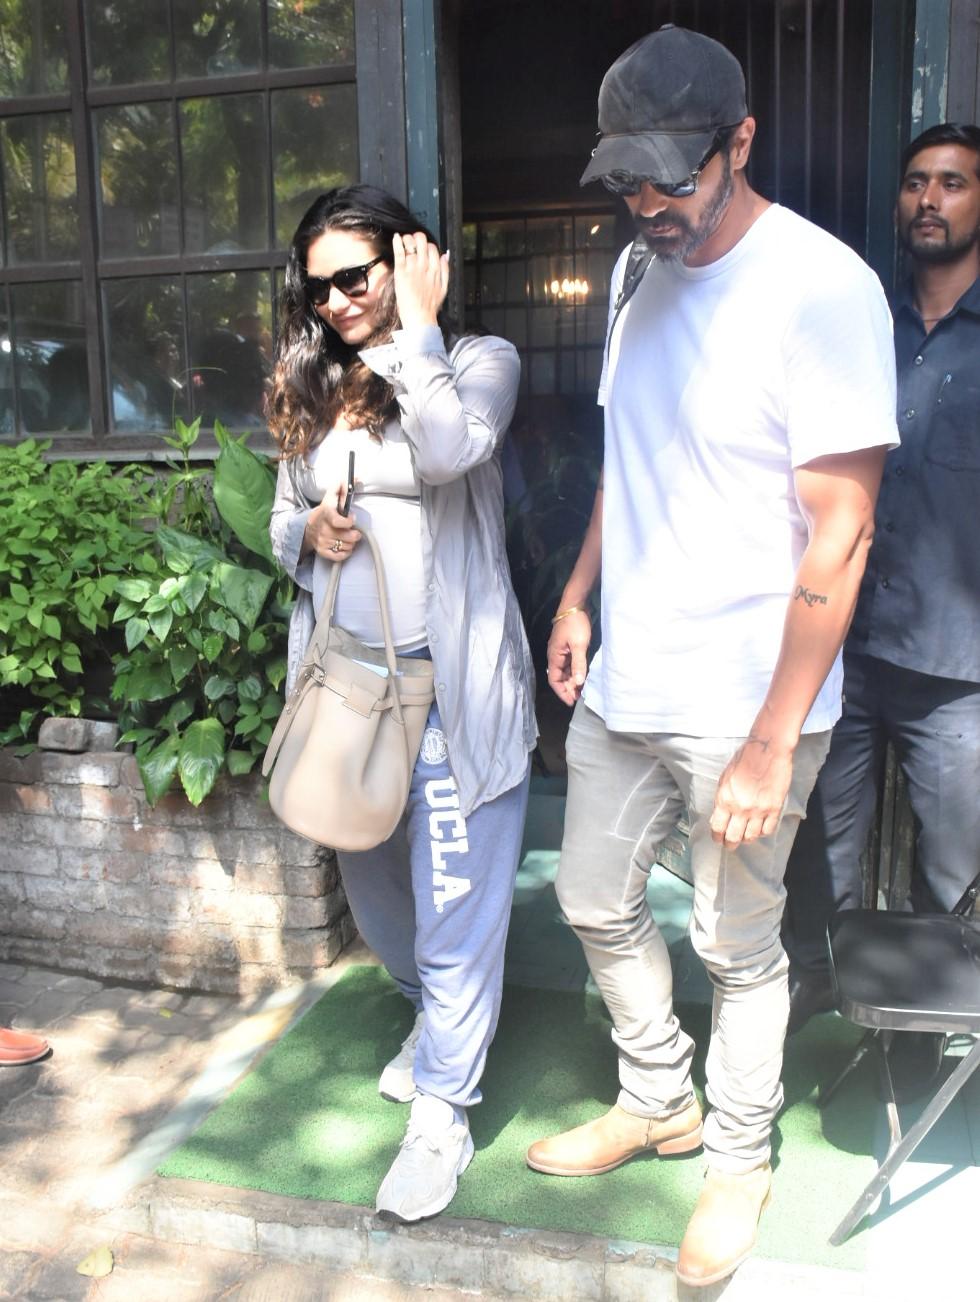 Arjun Rampal Has a Day Out With Pregnant Girlfriend Gabriella Demetriades